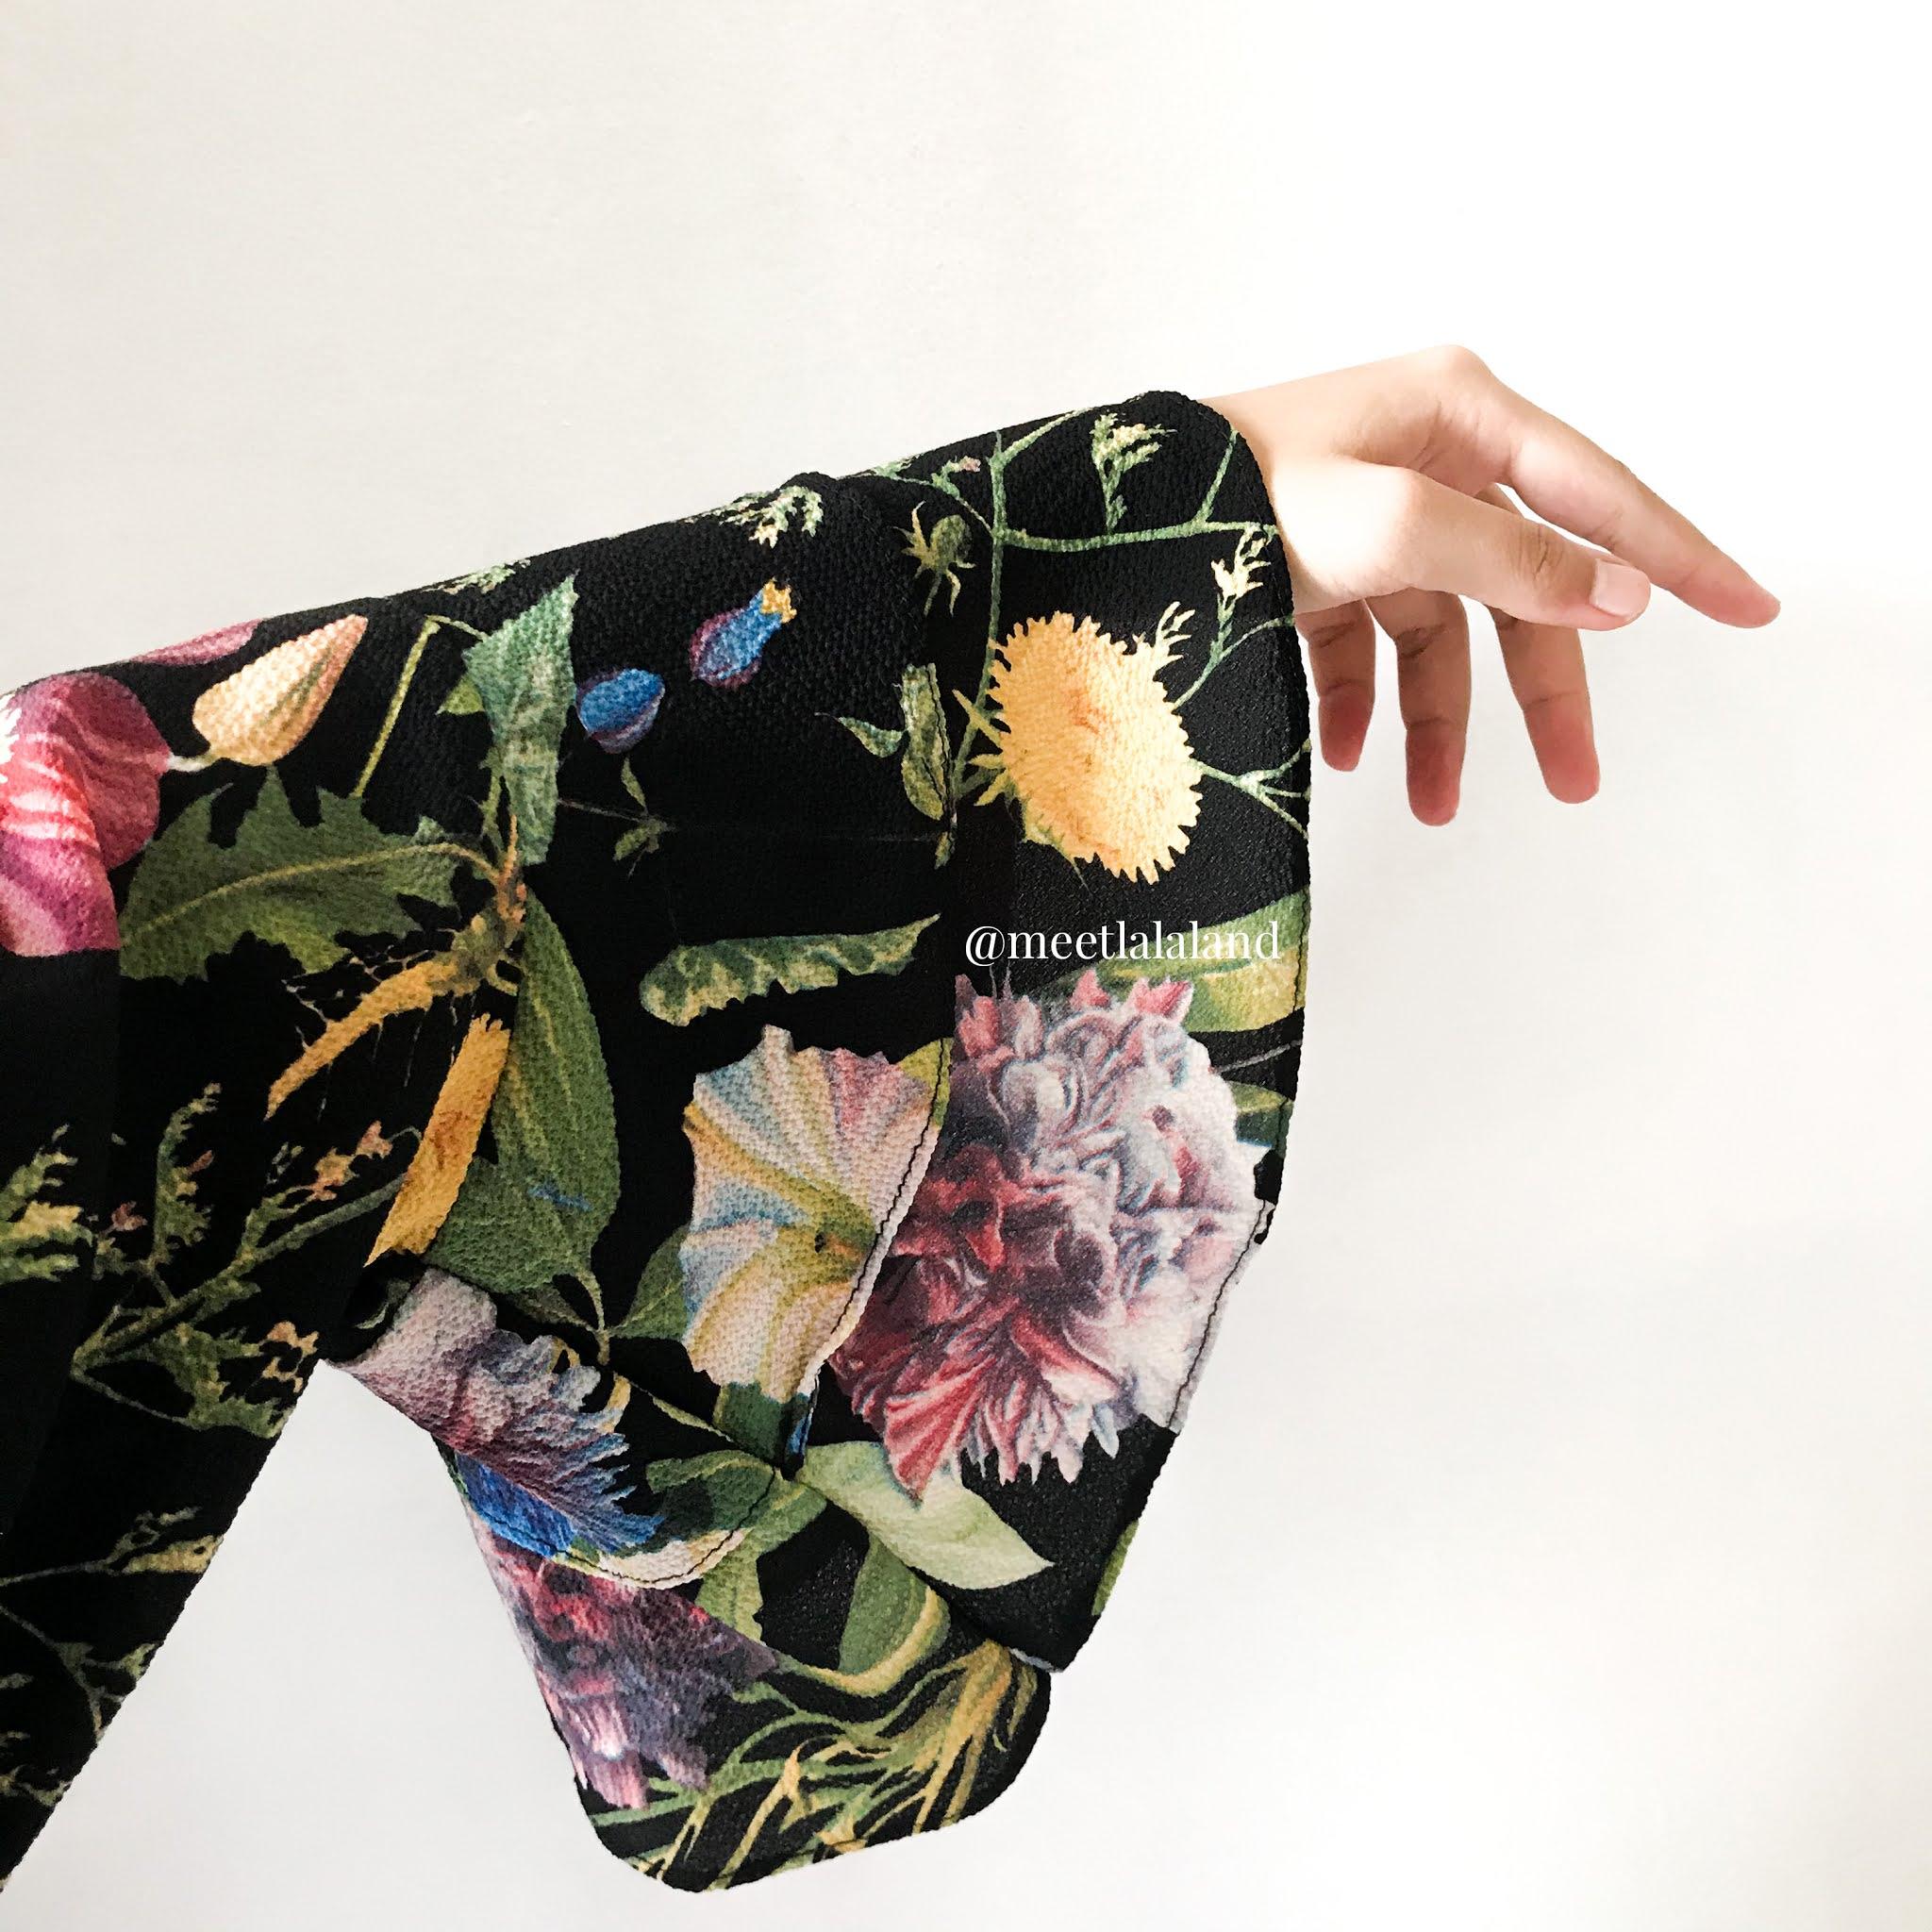 www.meetlalaland.com – cara mengakali pakaian motif bunga untuk semua tipe tubuh